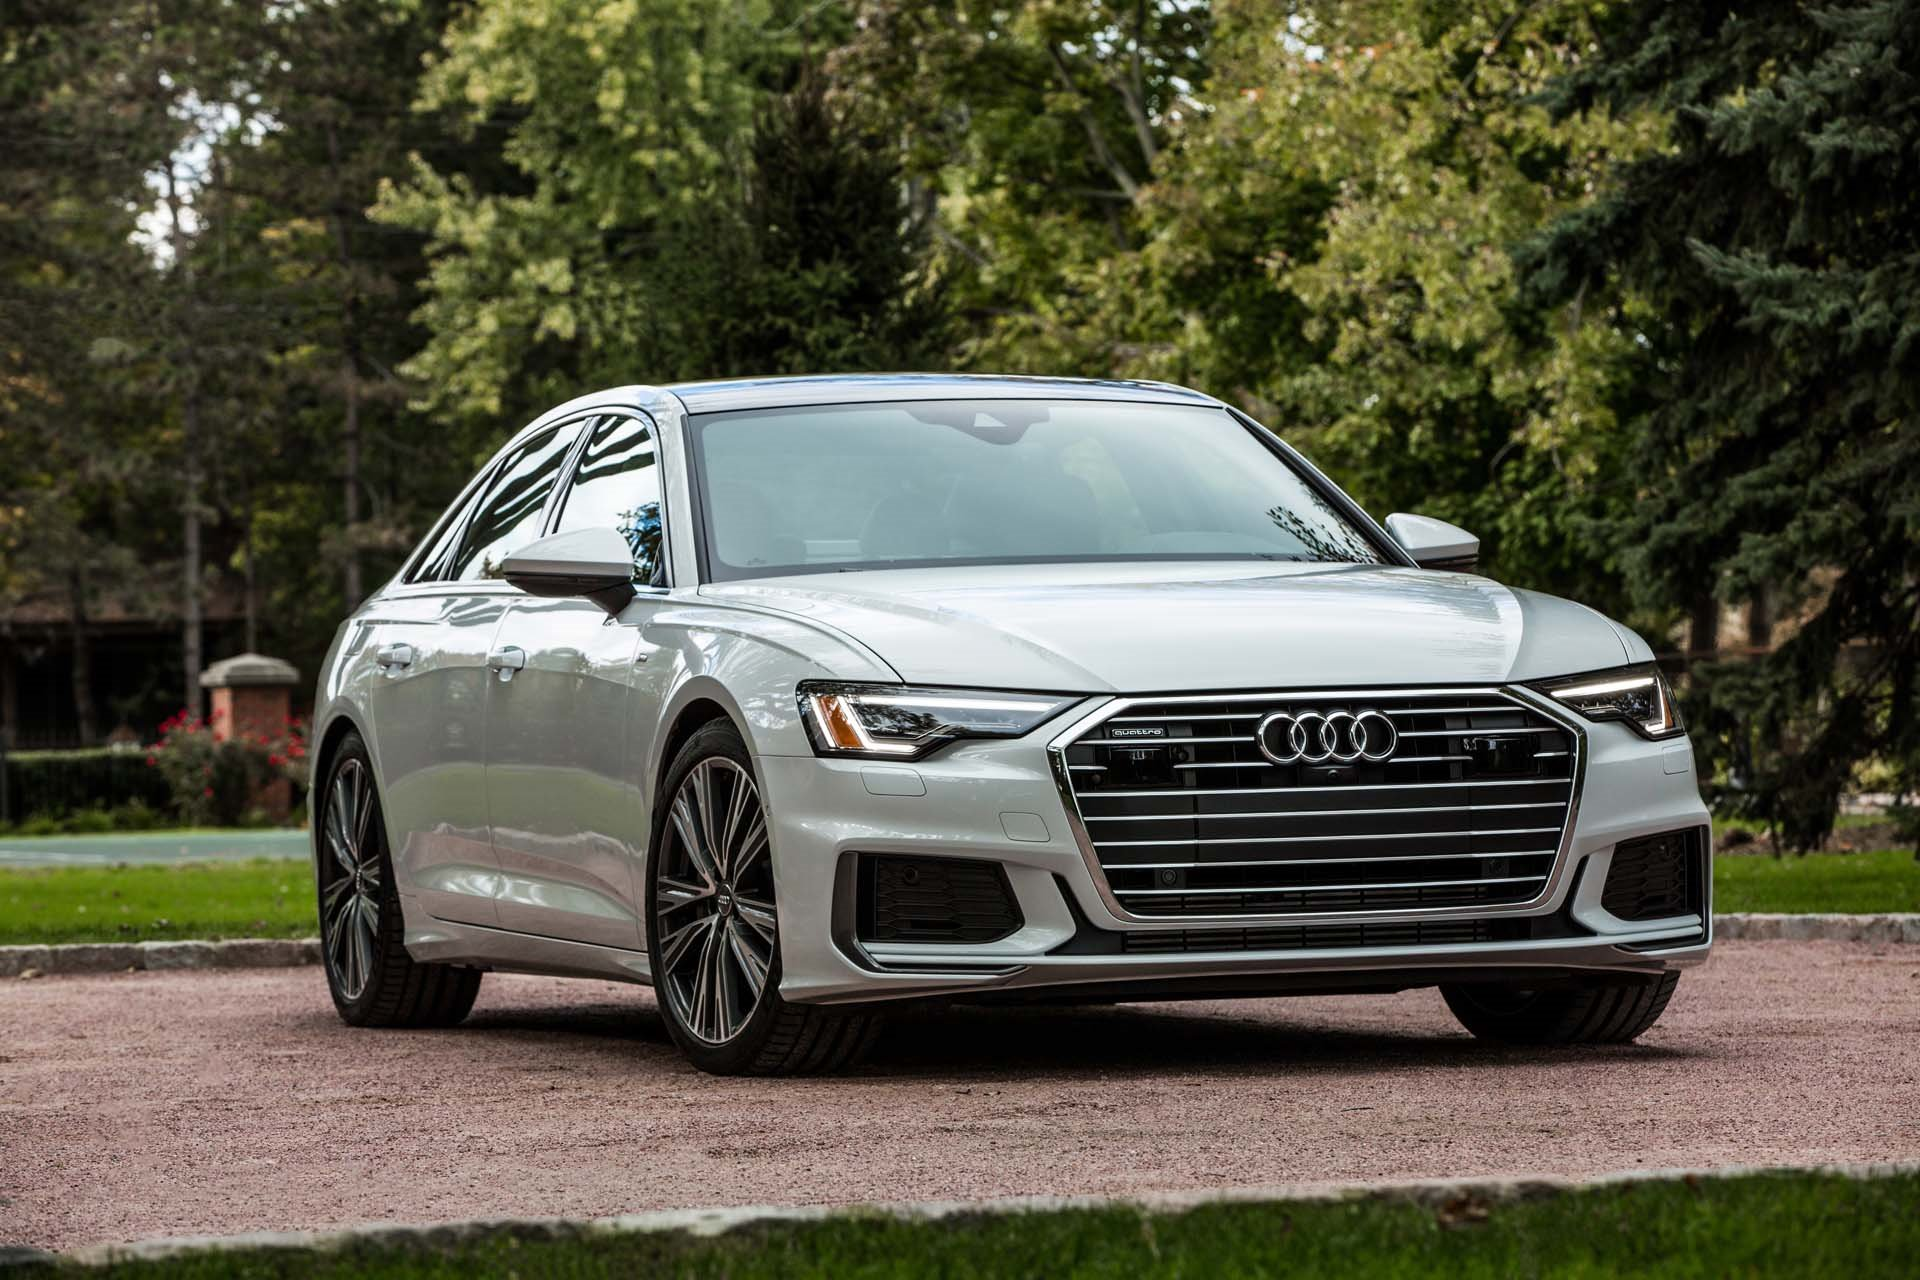 New 2019 Audi A6 3.0T quattro Prestige 3.0T quattro Prestige for sale $67,100 at M and V Leasing in Brooklyn NY 11223 1